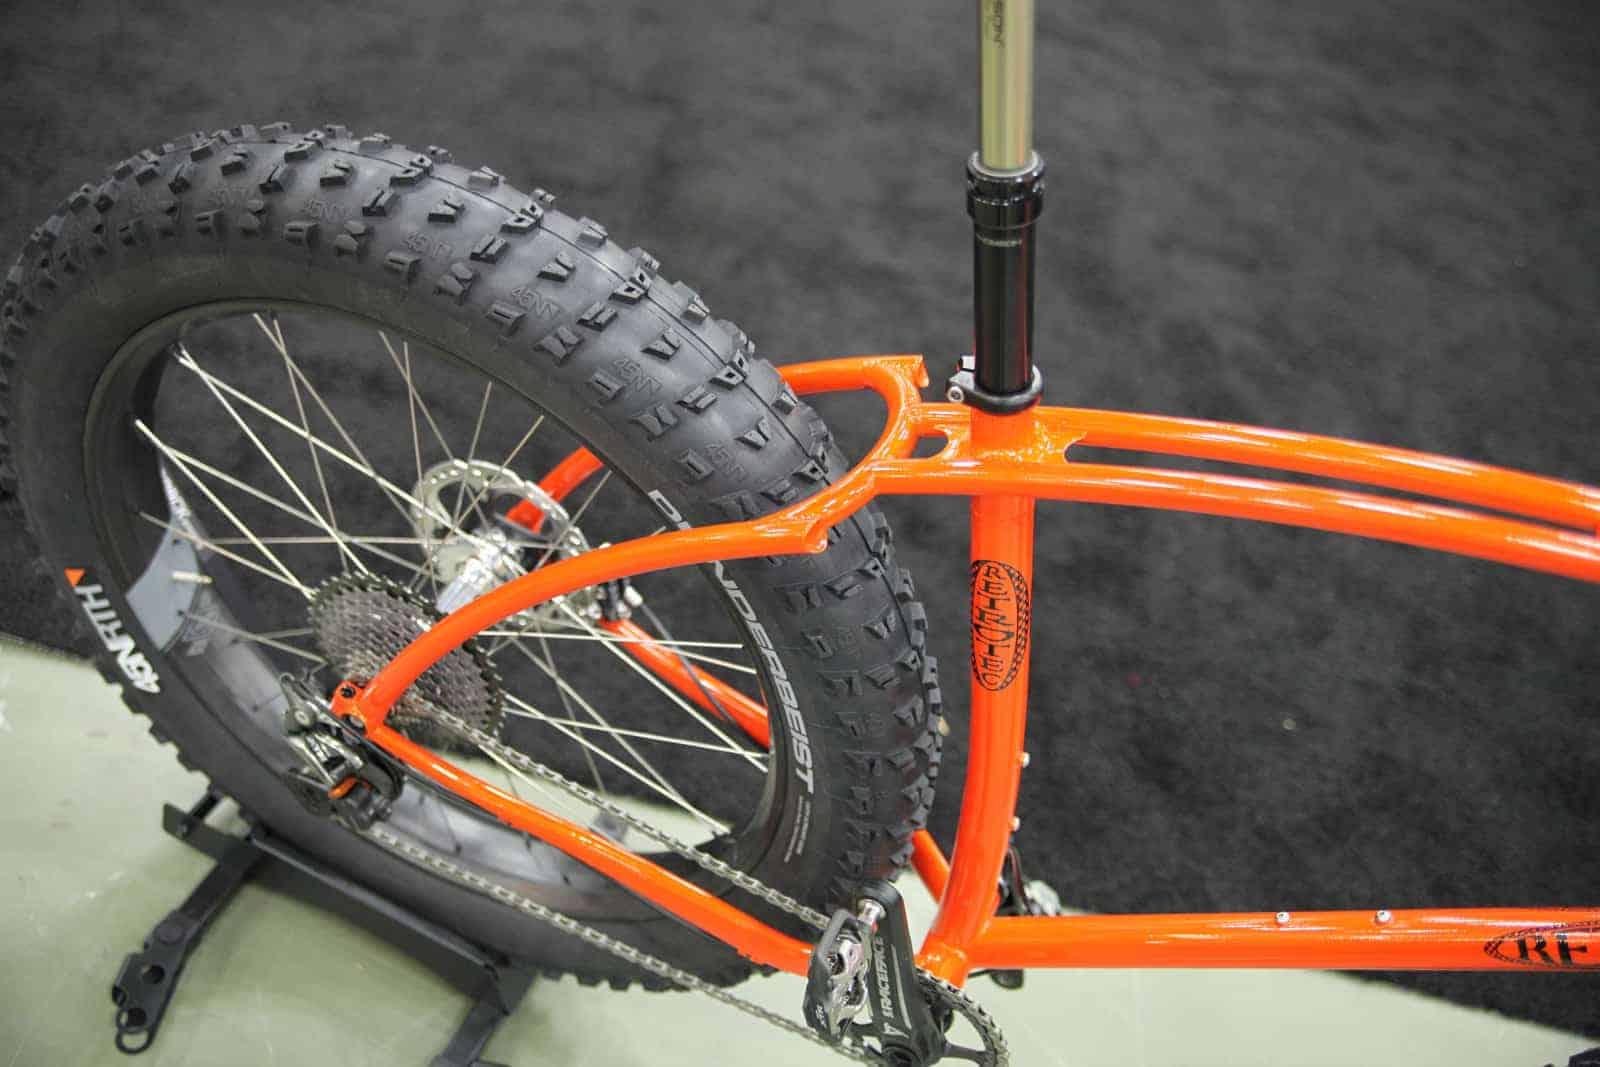 2015 Nahbs Retrotec Fat Bike And 29 Rigid